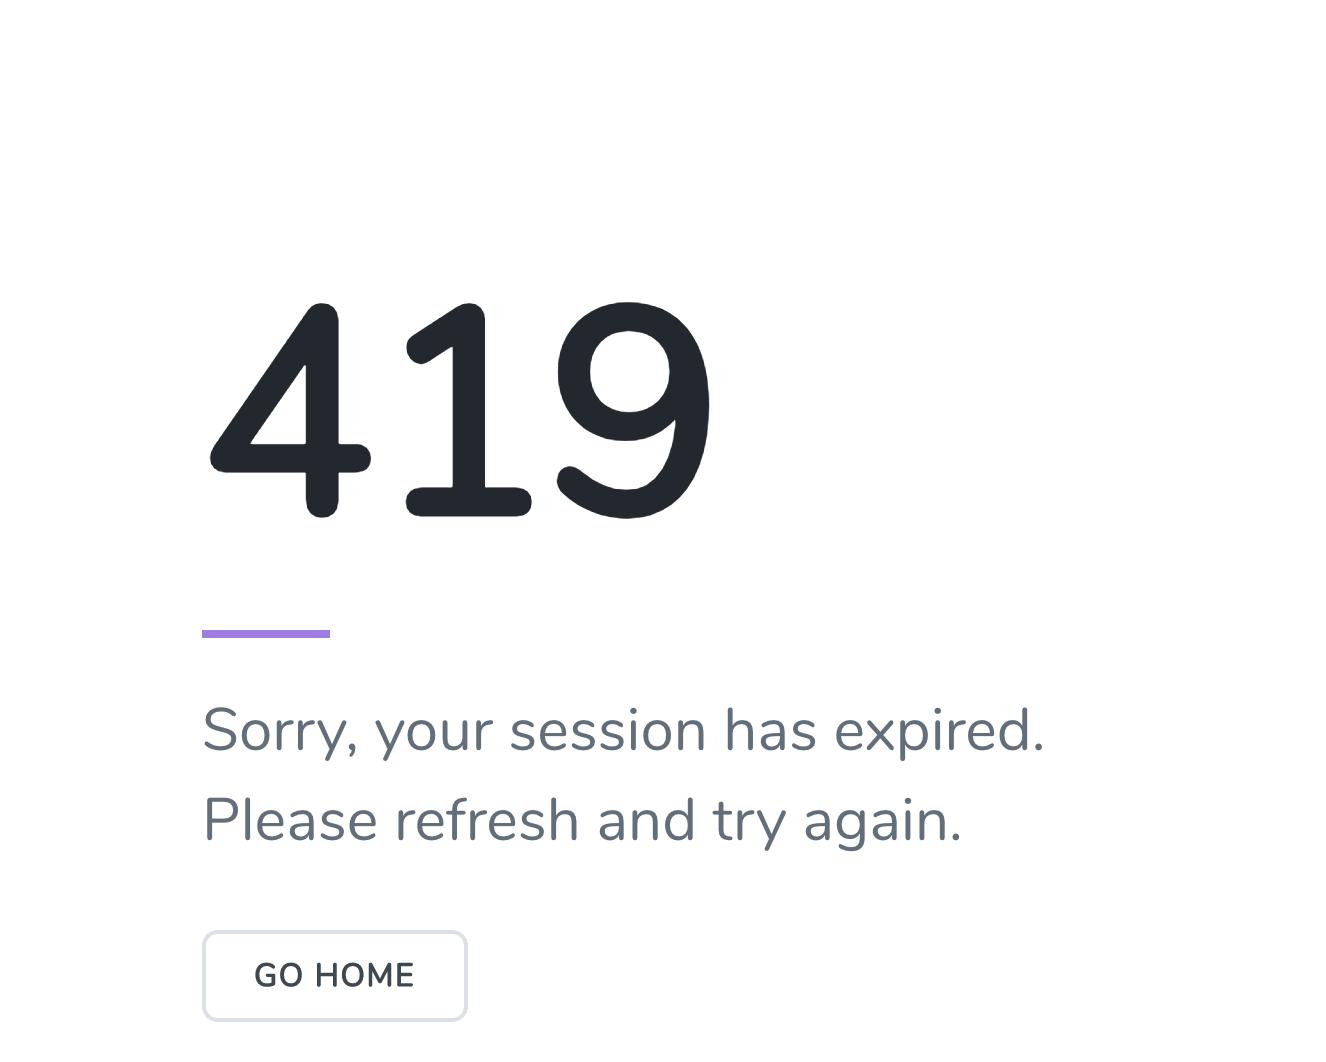 Laravel's default 419 error page